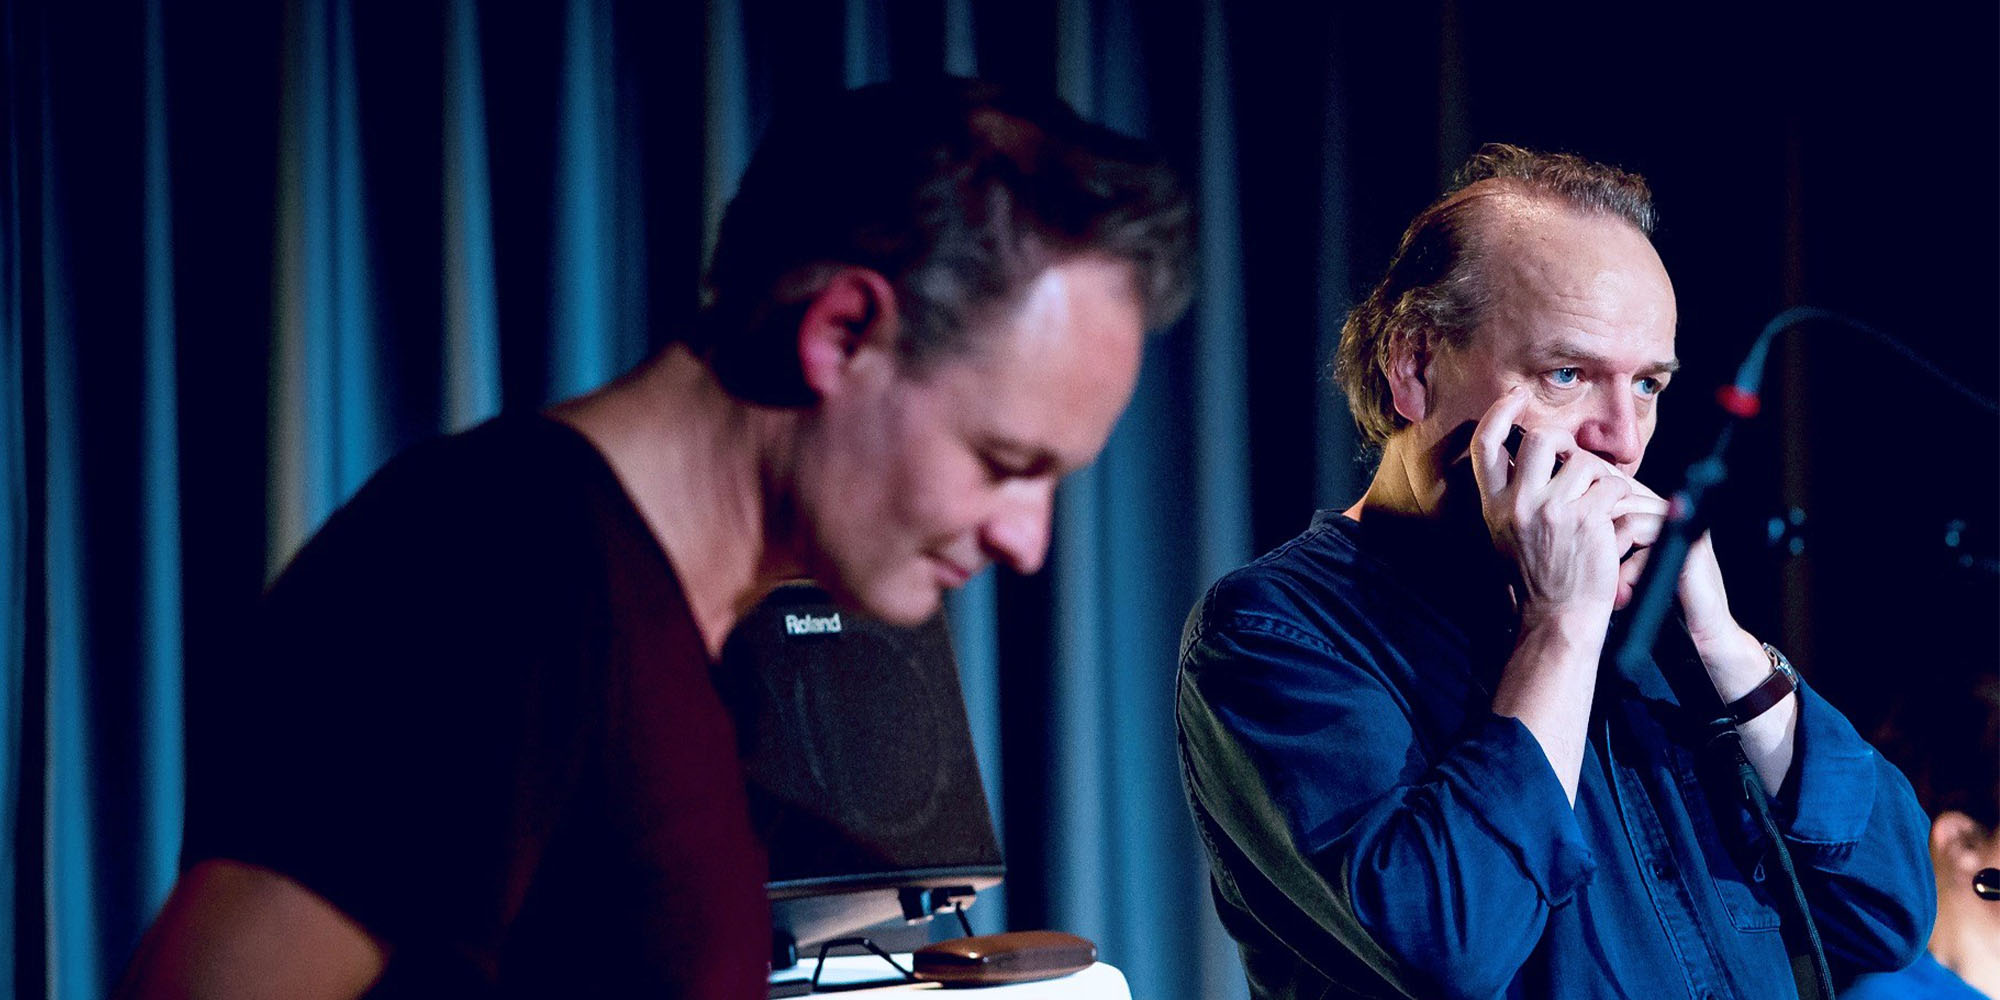 Flip Philipp Bertl & Mayer